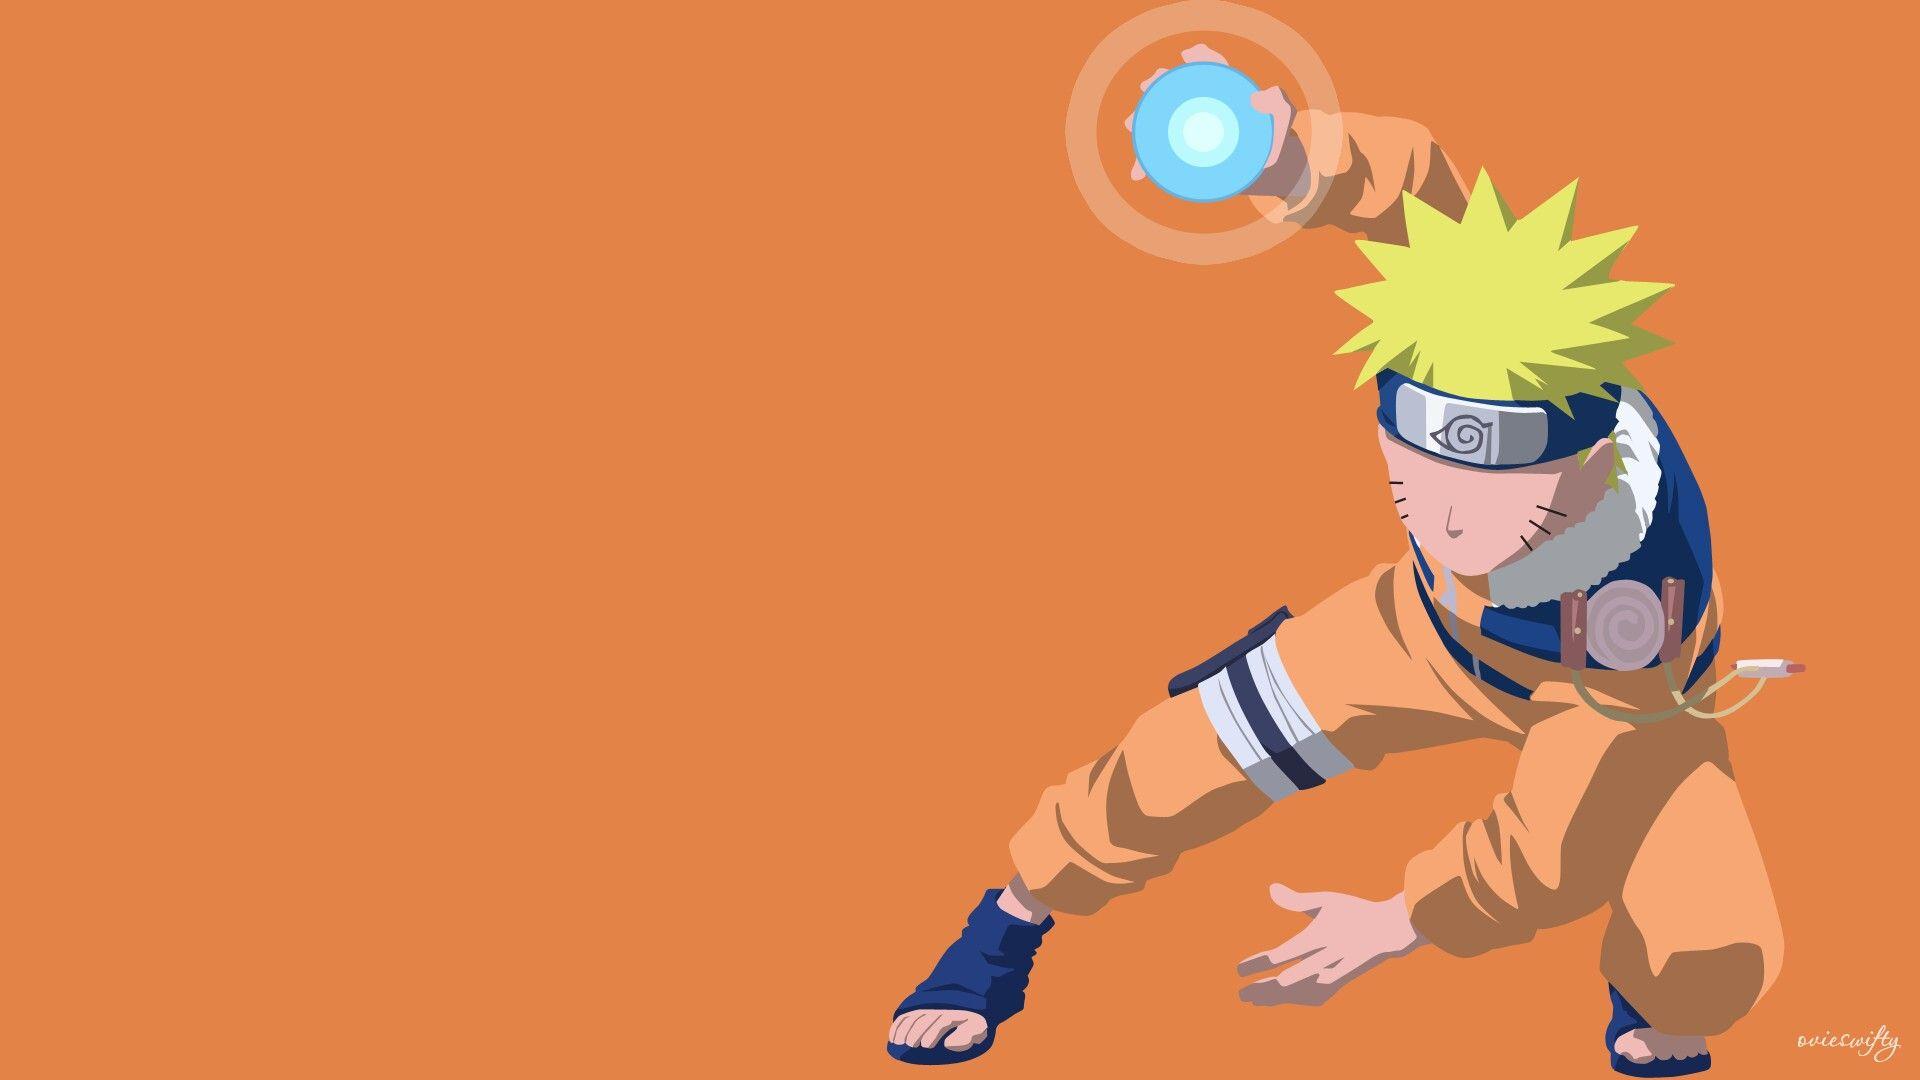 Must see Wallpaper Naruto Silhouette - f37492bf62df45c1bf77c91cb2bc067d  Pic.jpg